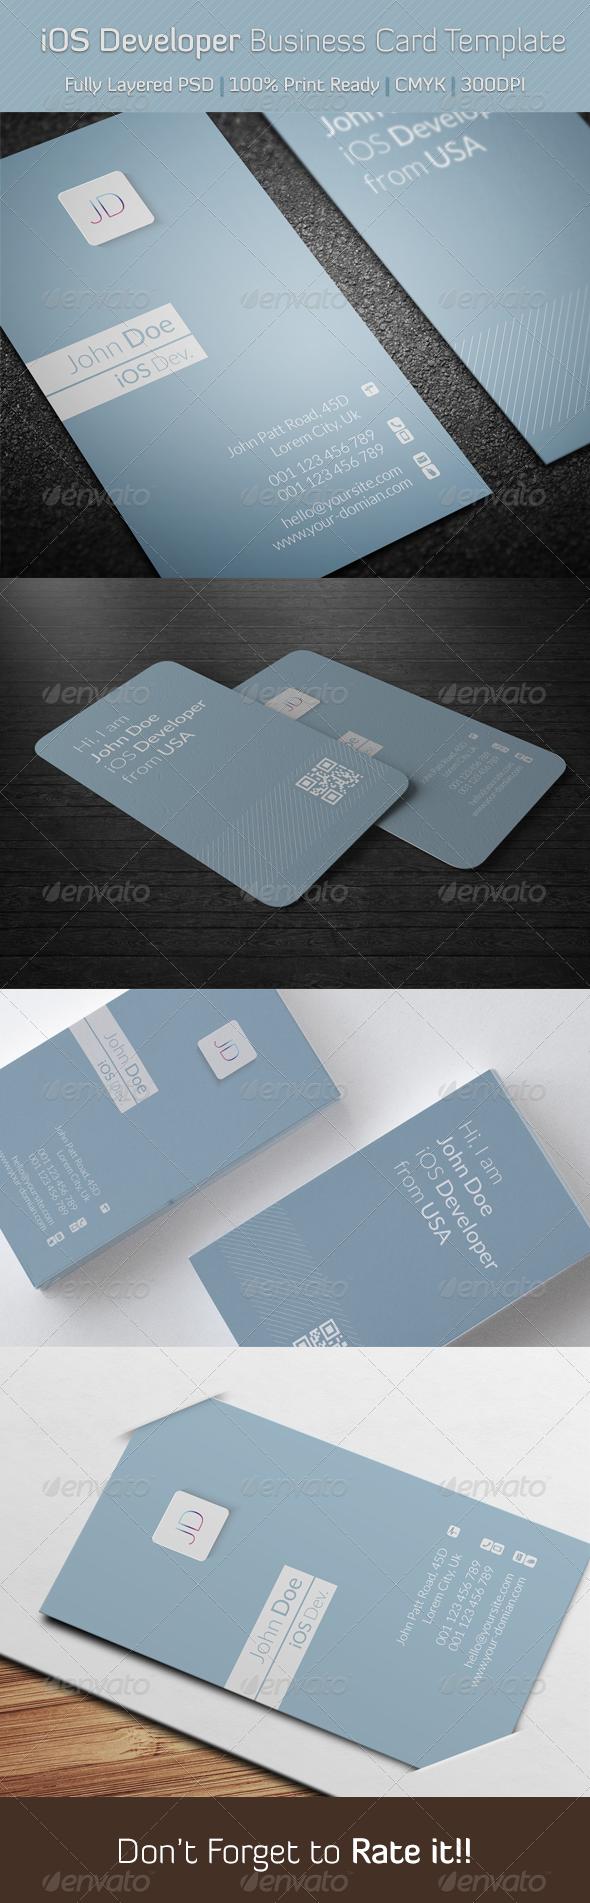 iOS Developer Business Card Template - Creative Business Cards